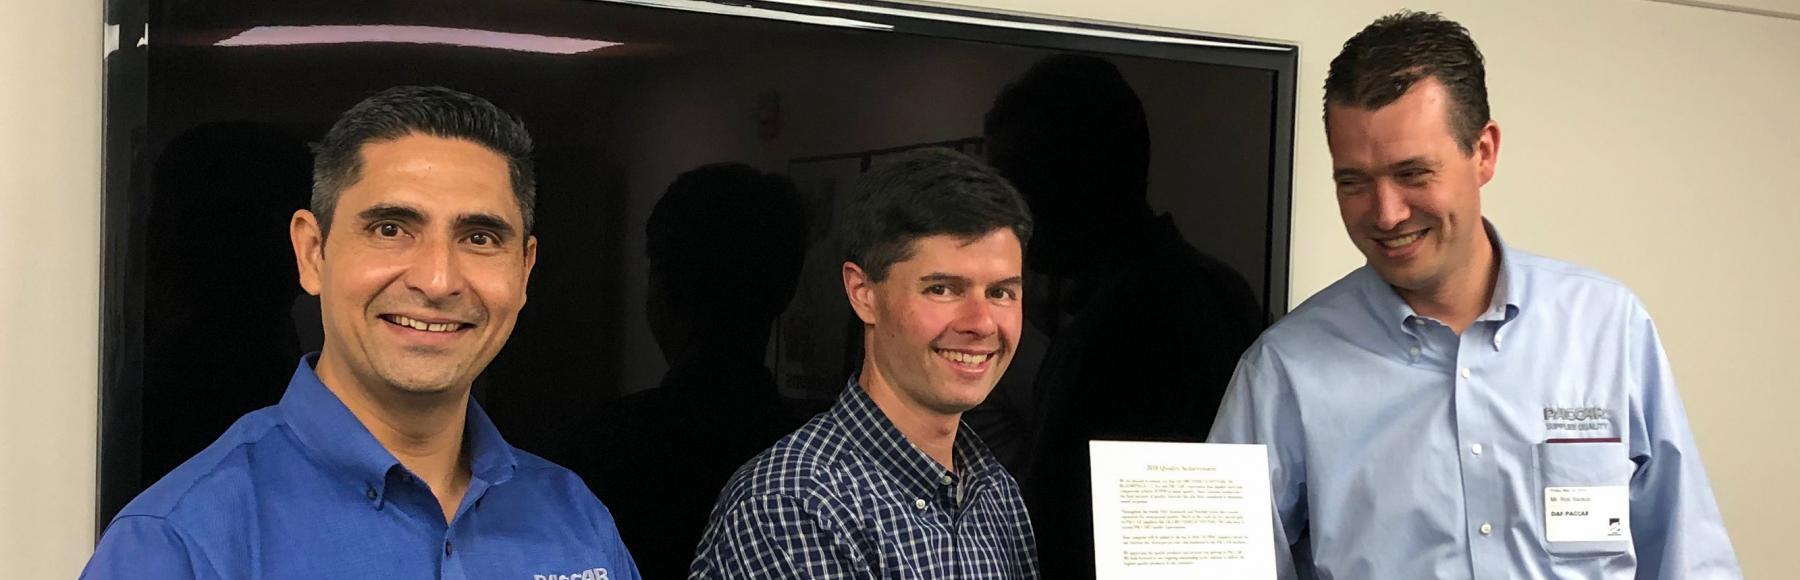 Jacobs荣获PACCAR颁发的10 PPM奖